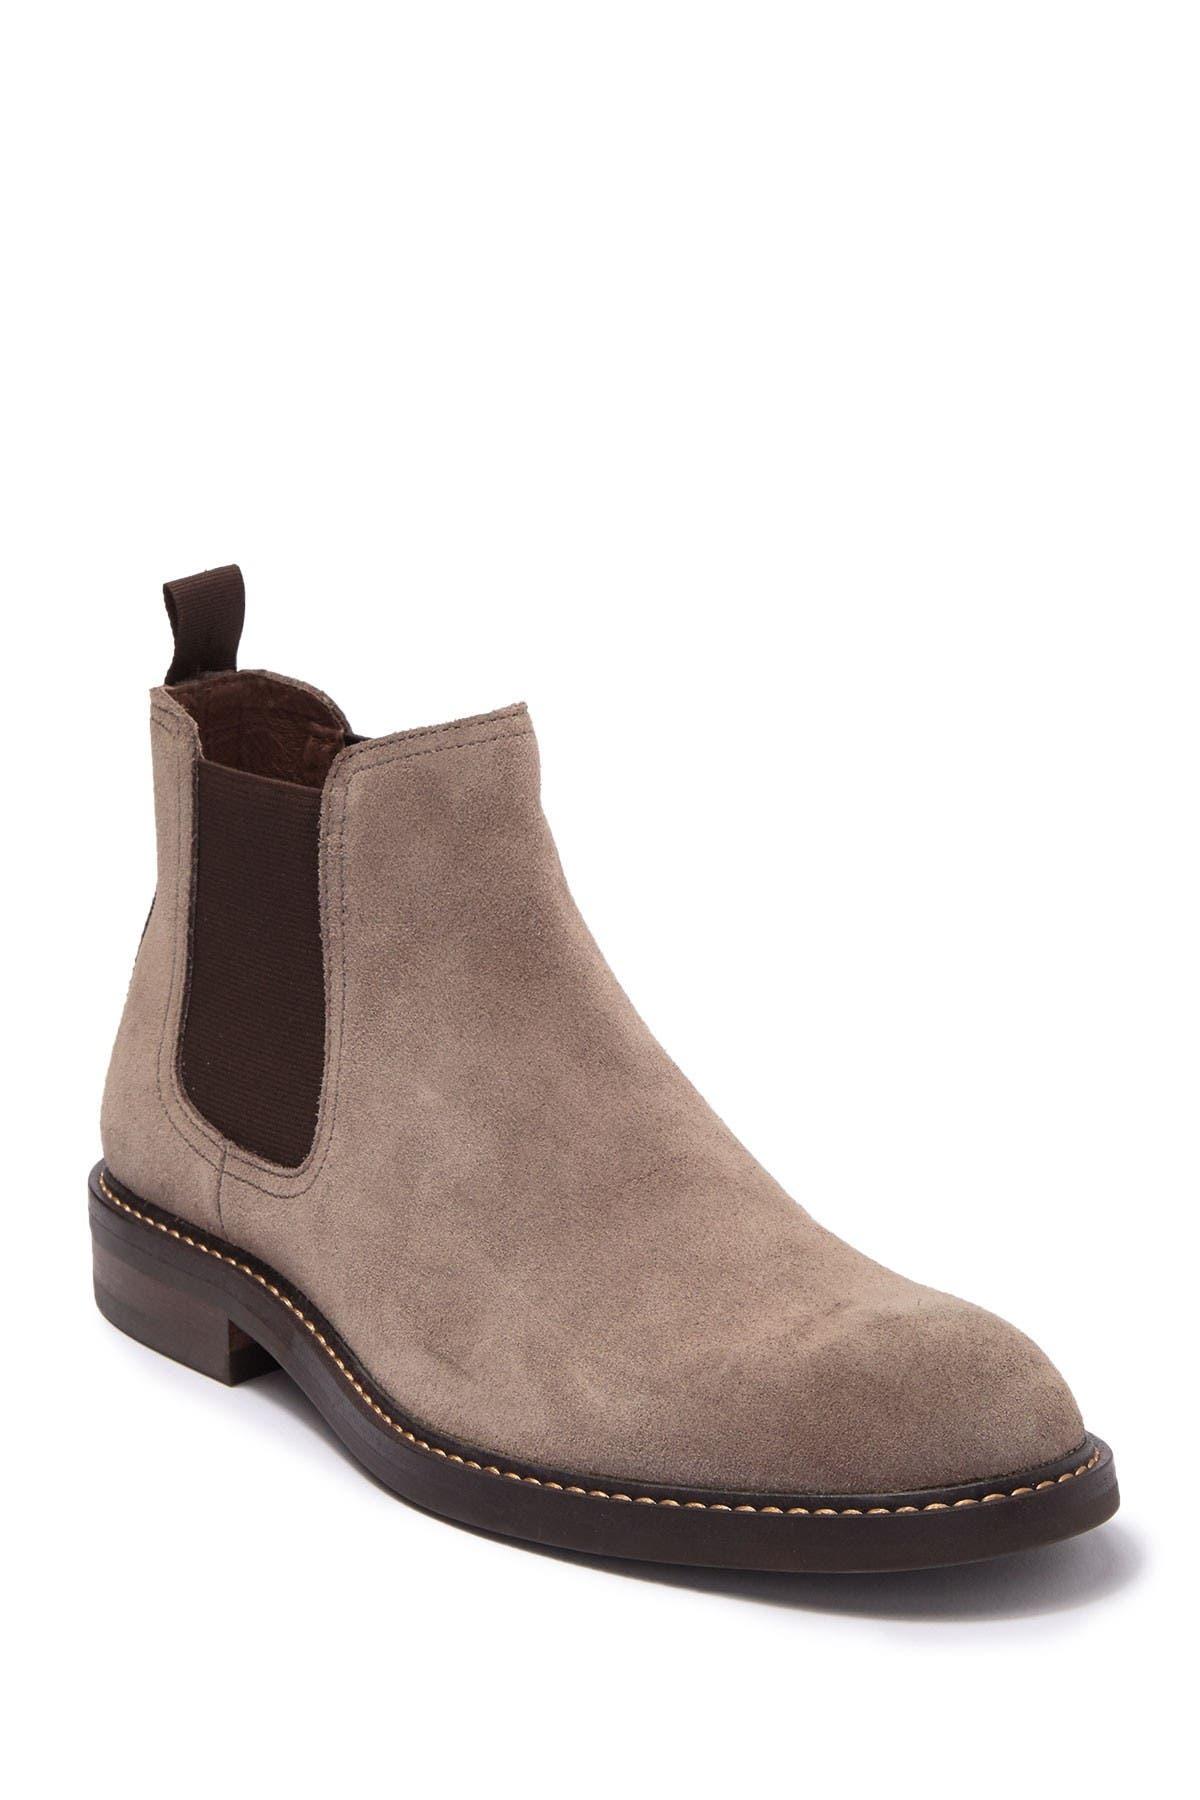 1901 | Horton Leather Chelsea Boot